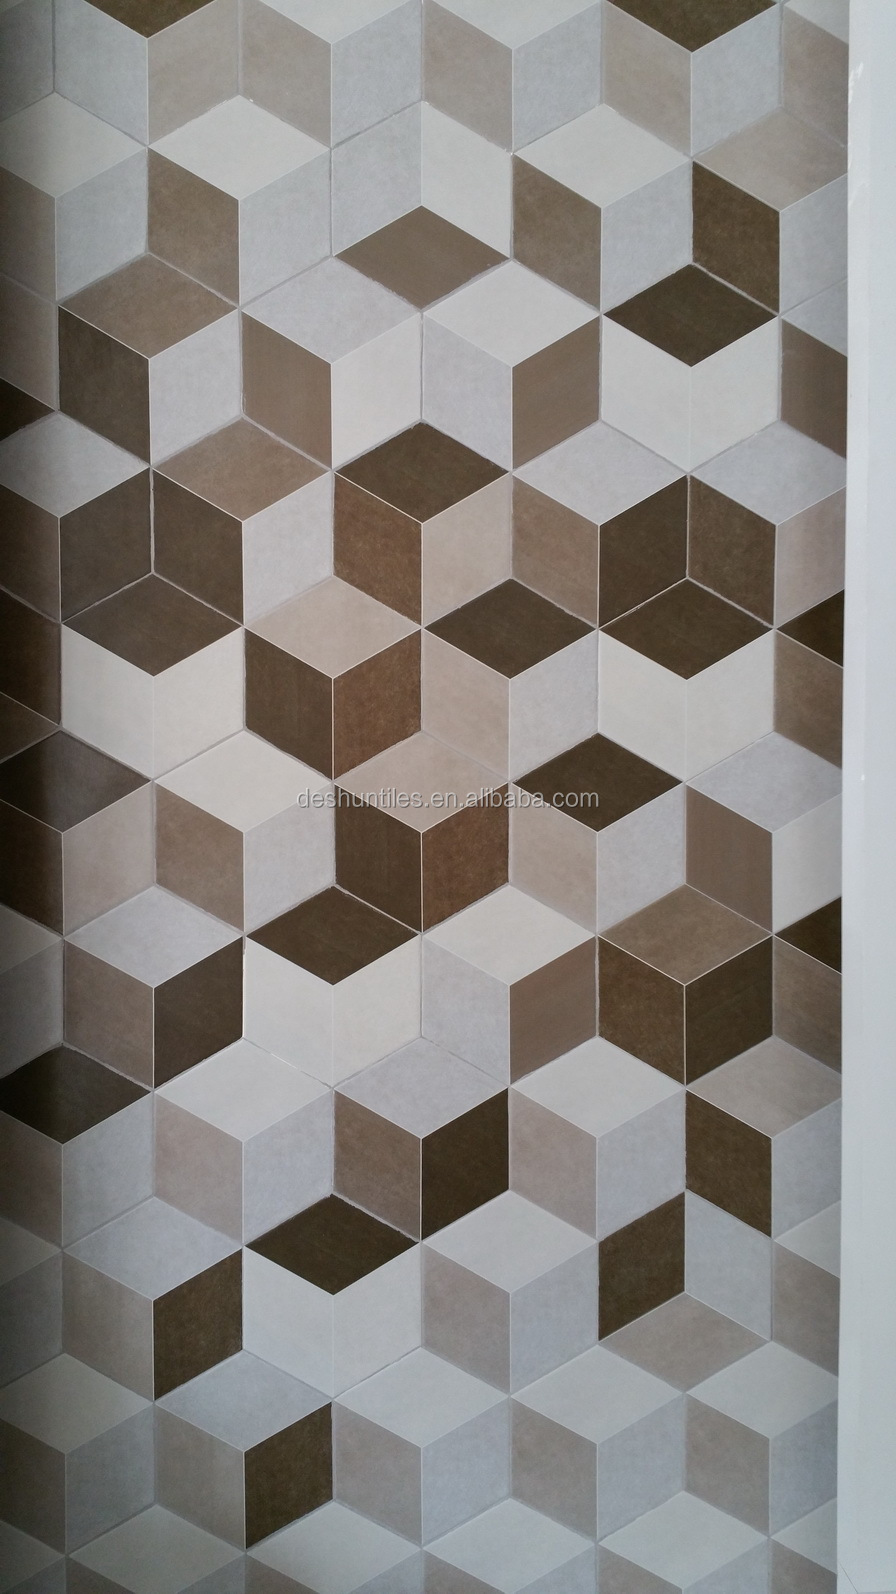 Three Dimensional Hexagon Marble Tile For Floor Buy